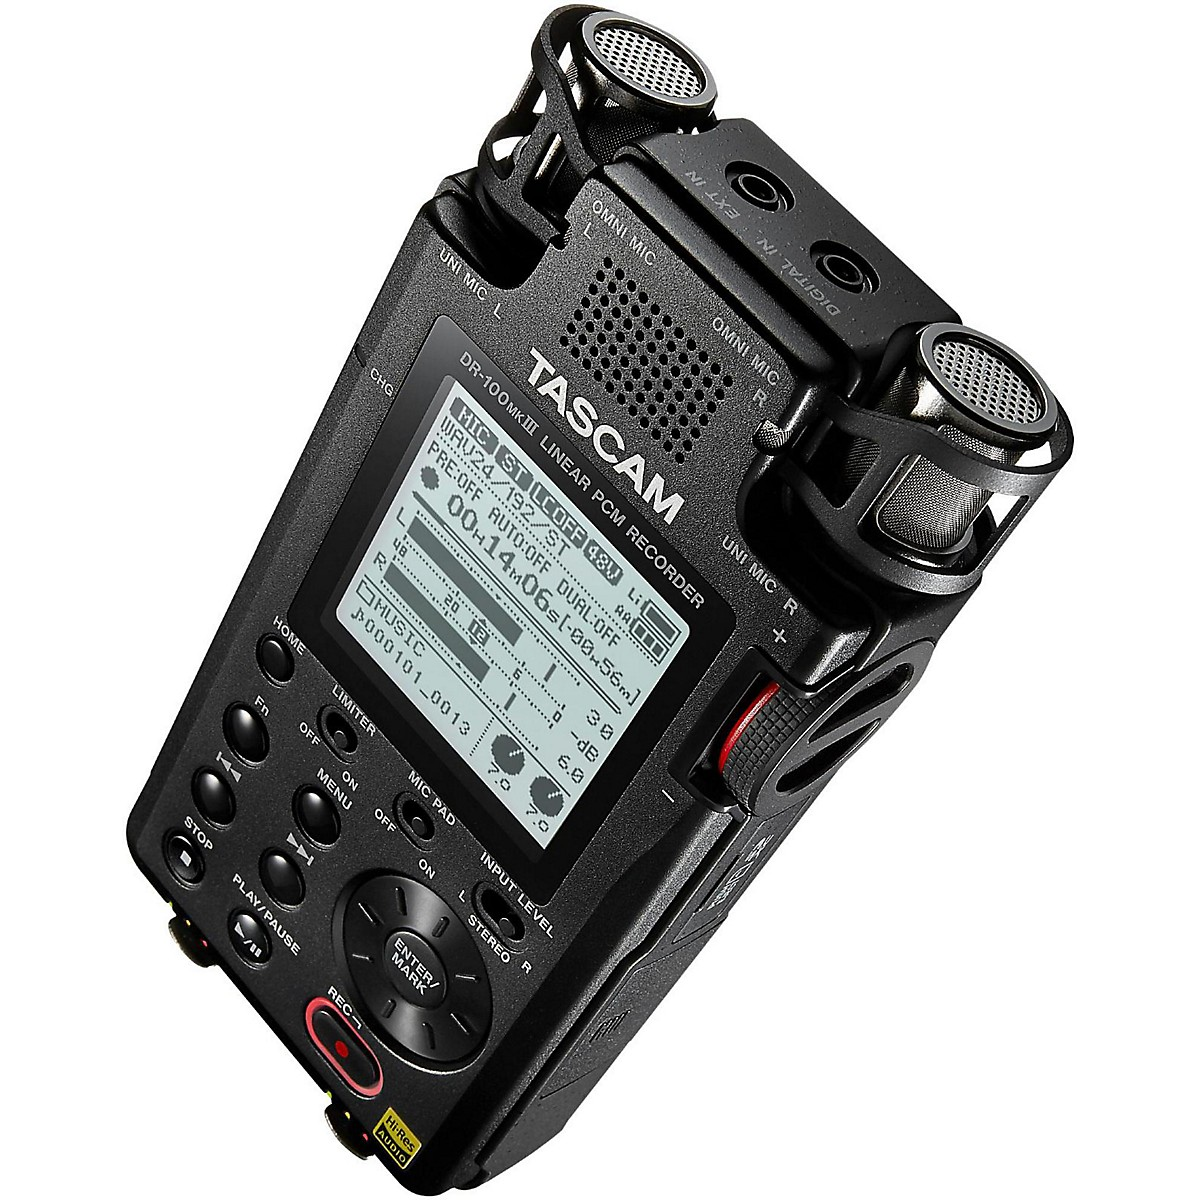 Tascam DR-100mkIII 2-ch Handheld Digital Stereo Recorder